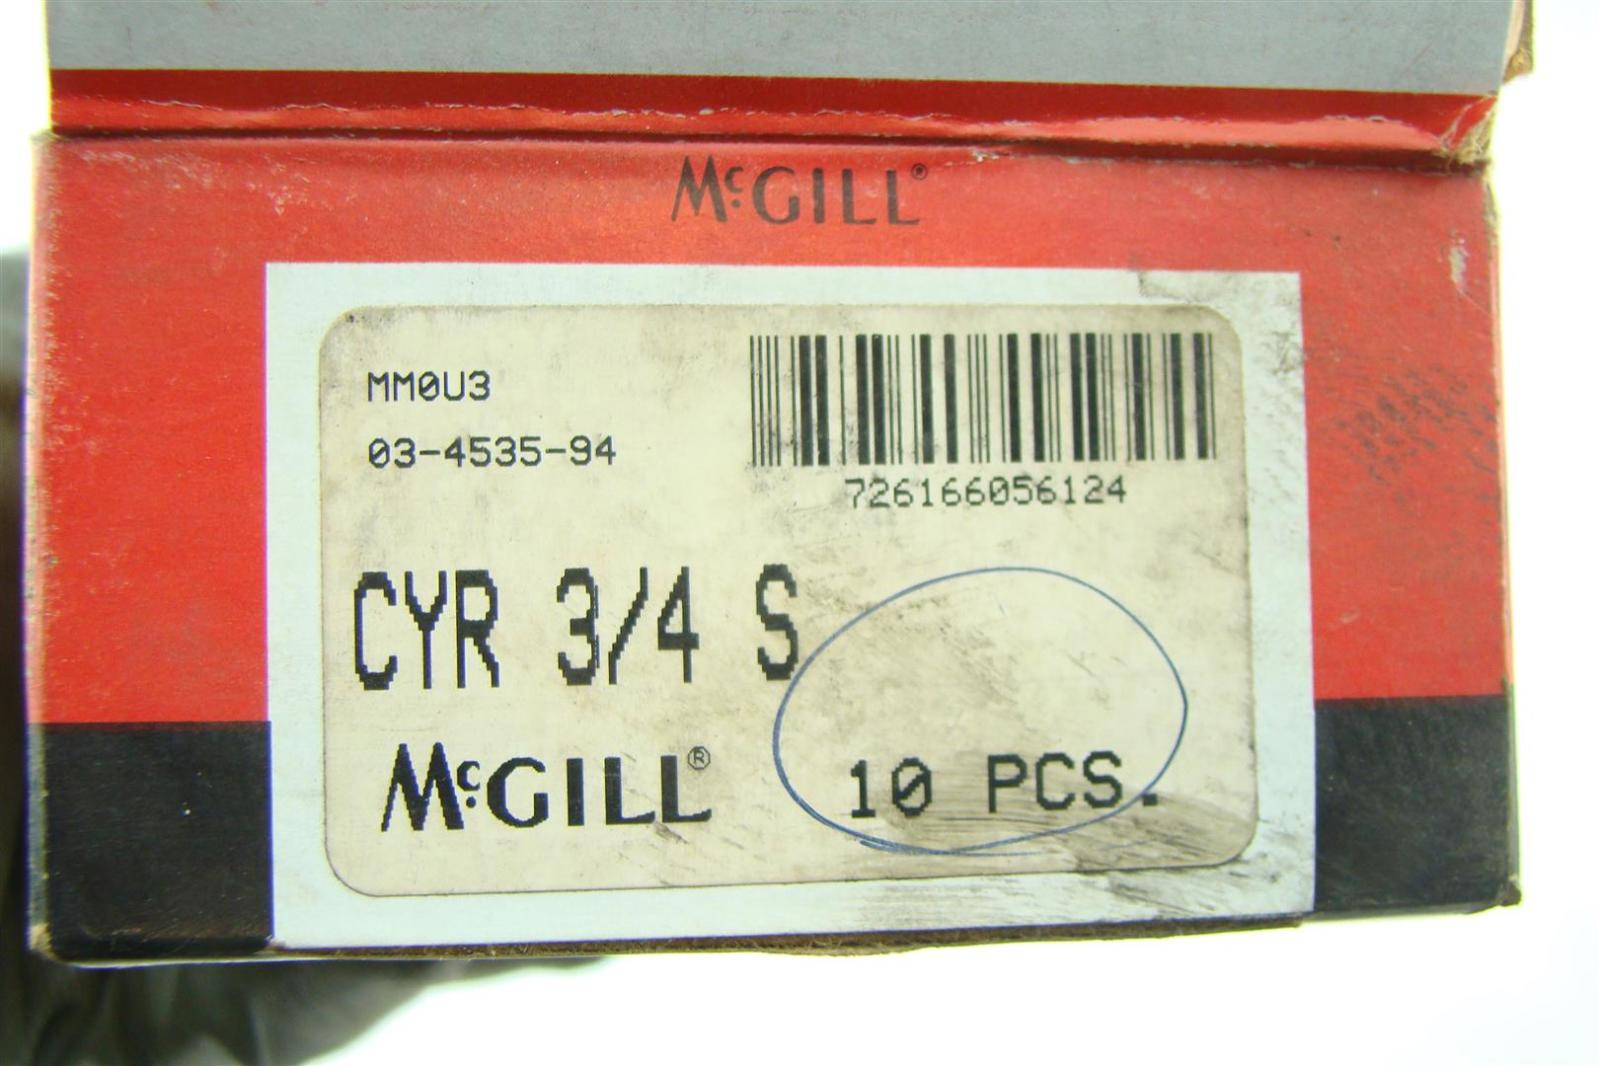 (10) McGill Cam Followers CYR 3/4 S